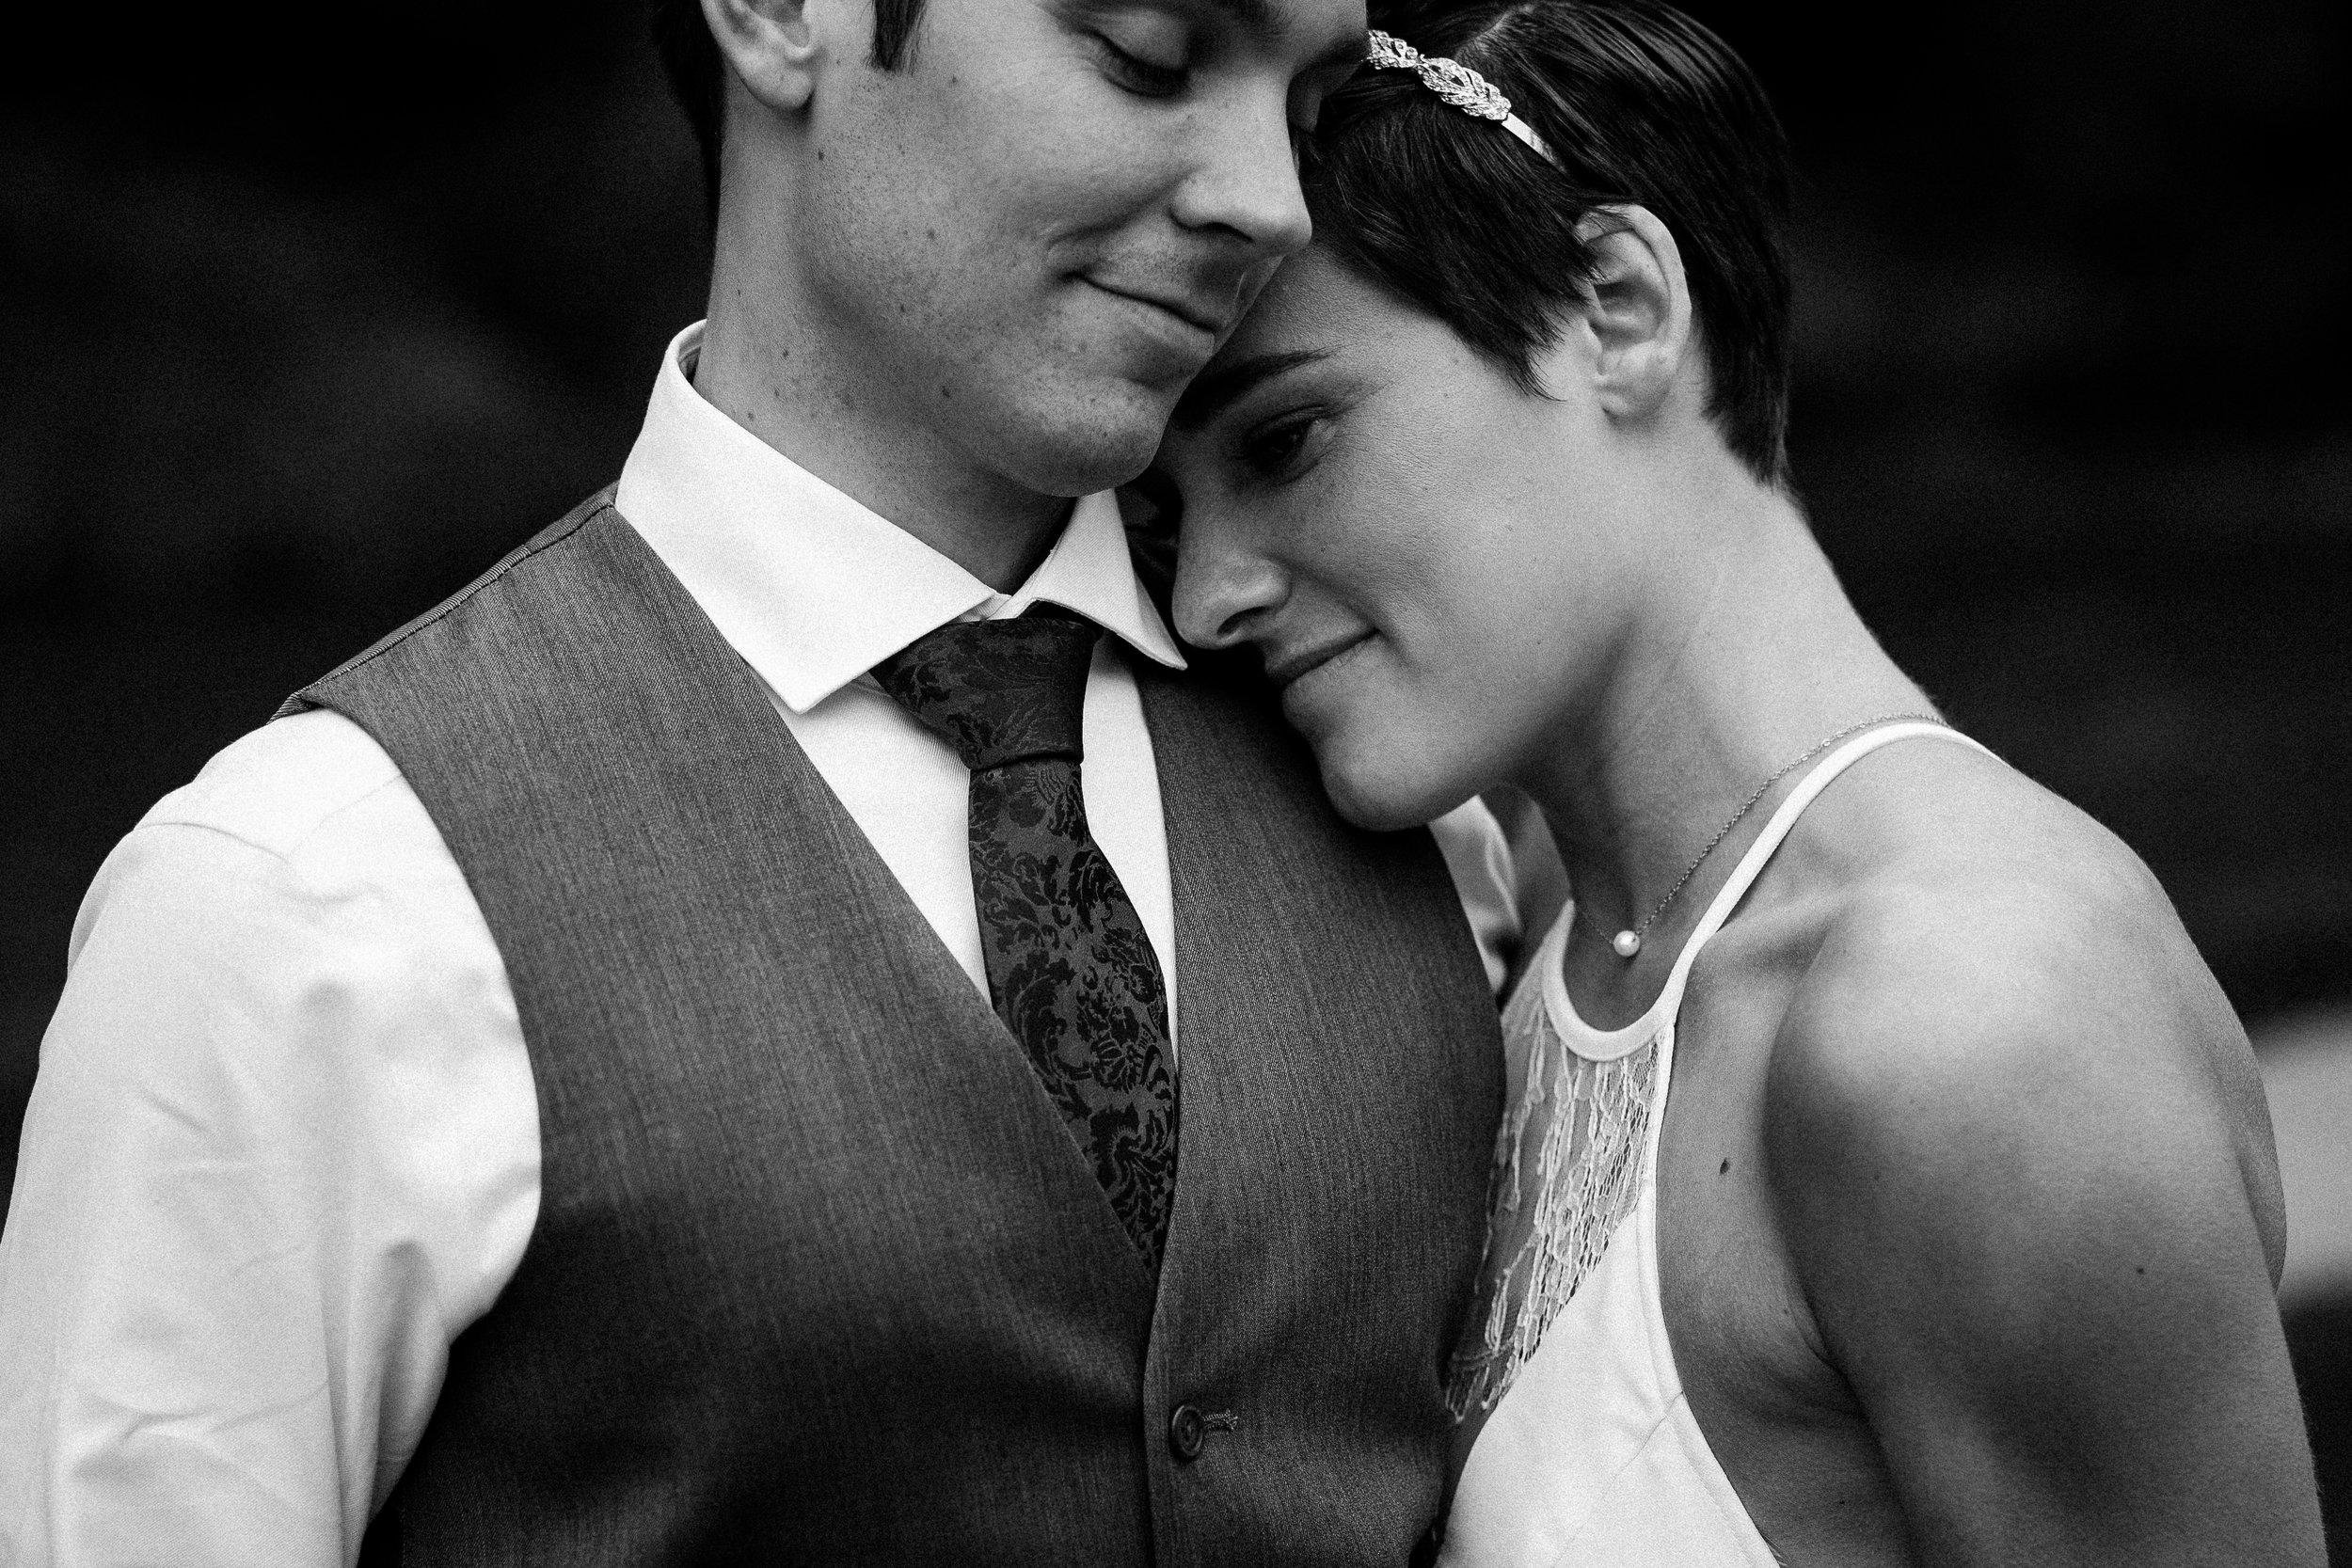 nicole-daacke-photography-sedona-arizona-destination-elopement-wedding-photographer-catherdral-rock-hiking-elopement-sedona-river-elopement-photos-desert-rock-wedding-photographer-laid-back-spontaneous-elopement-109.jpg